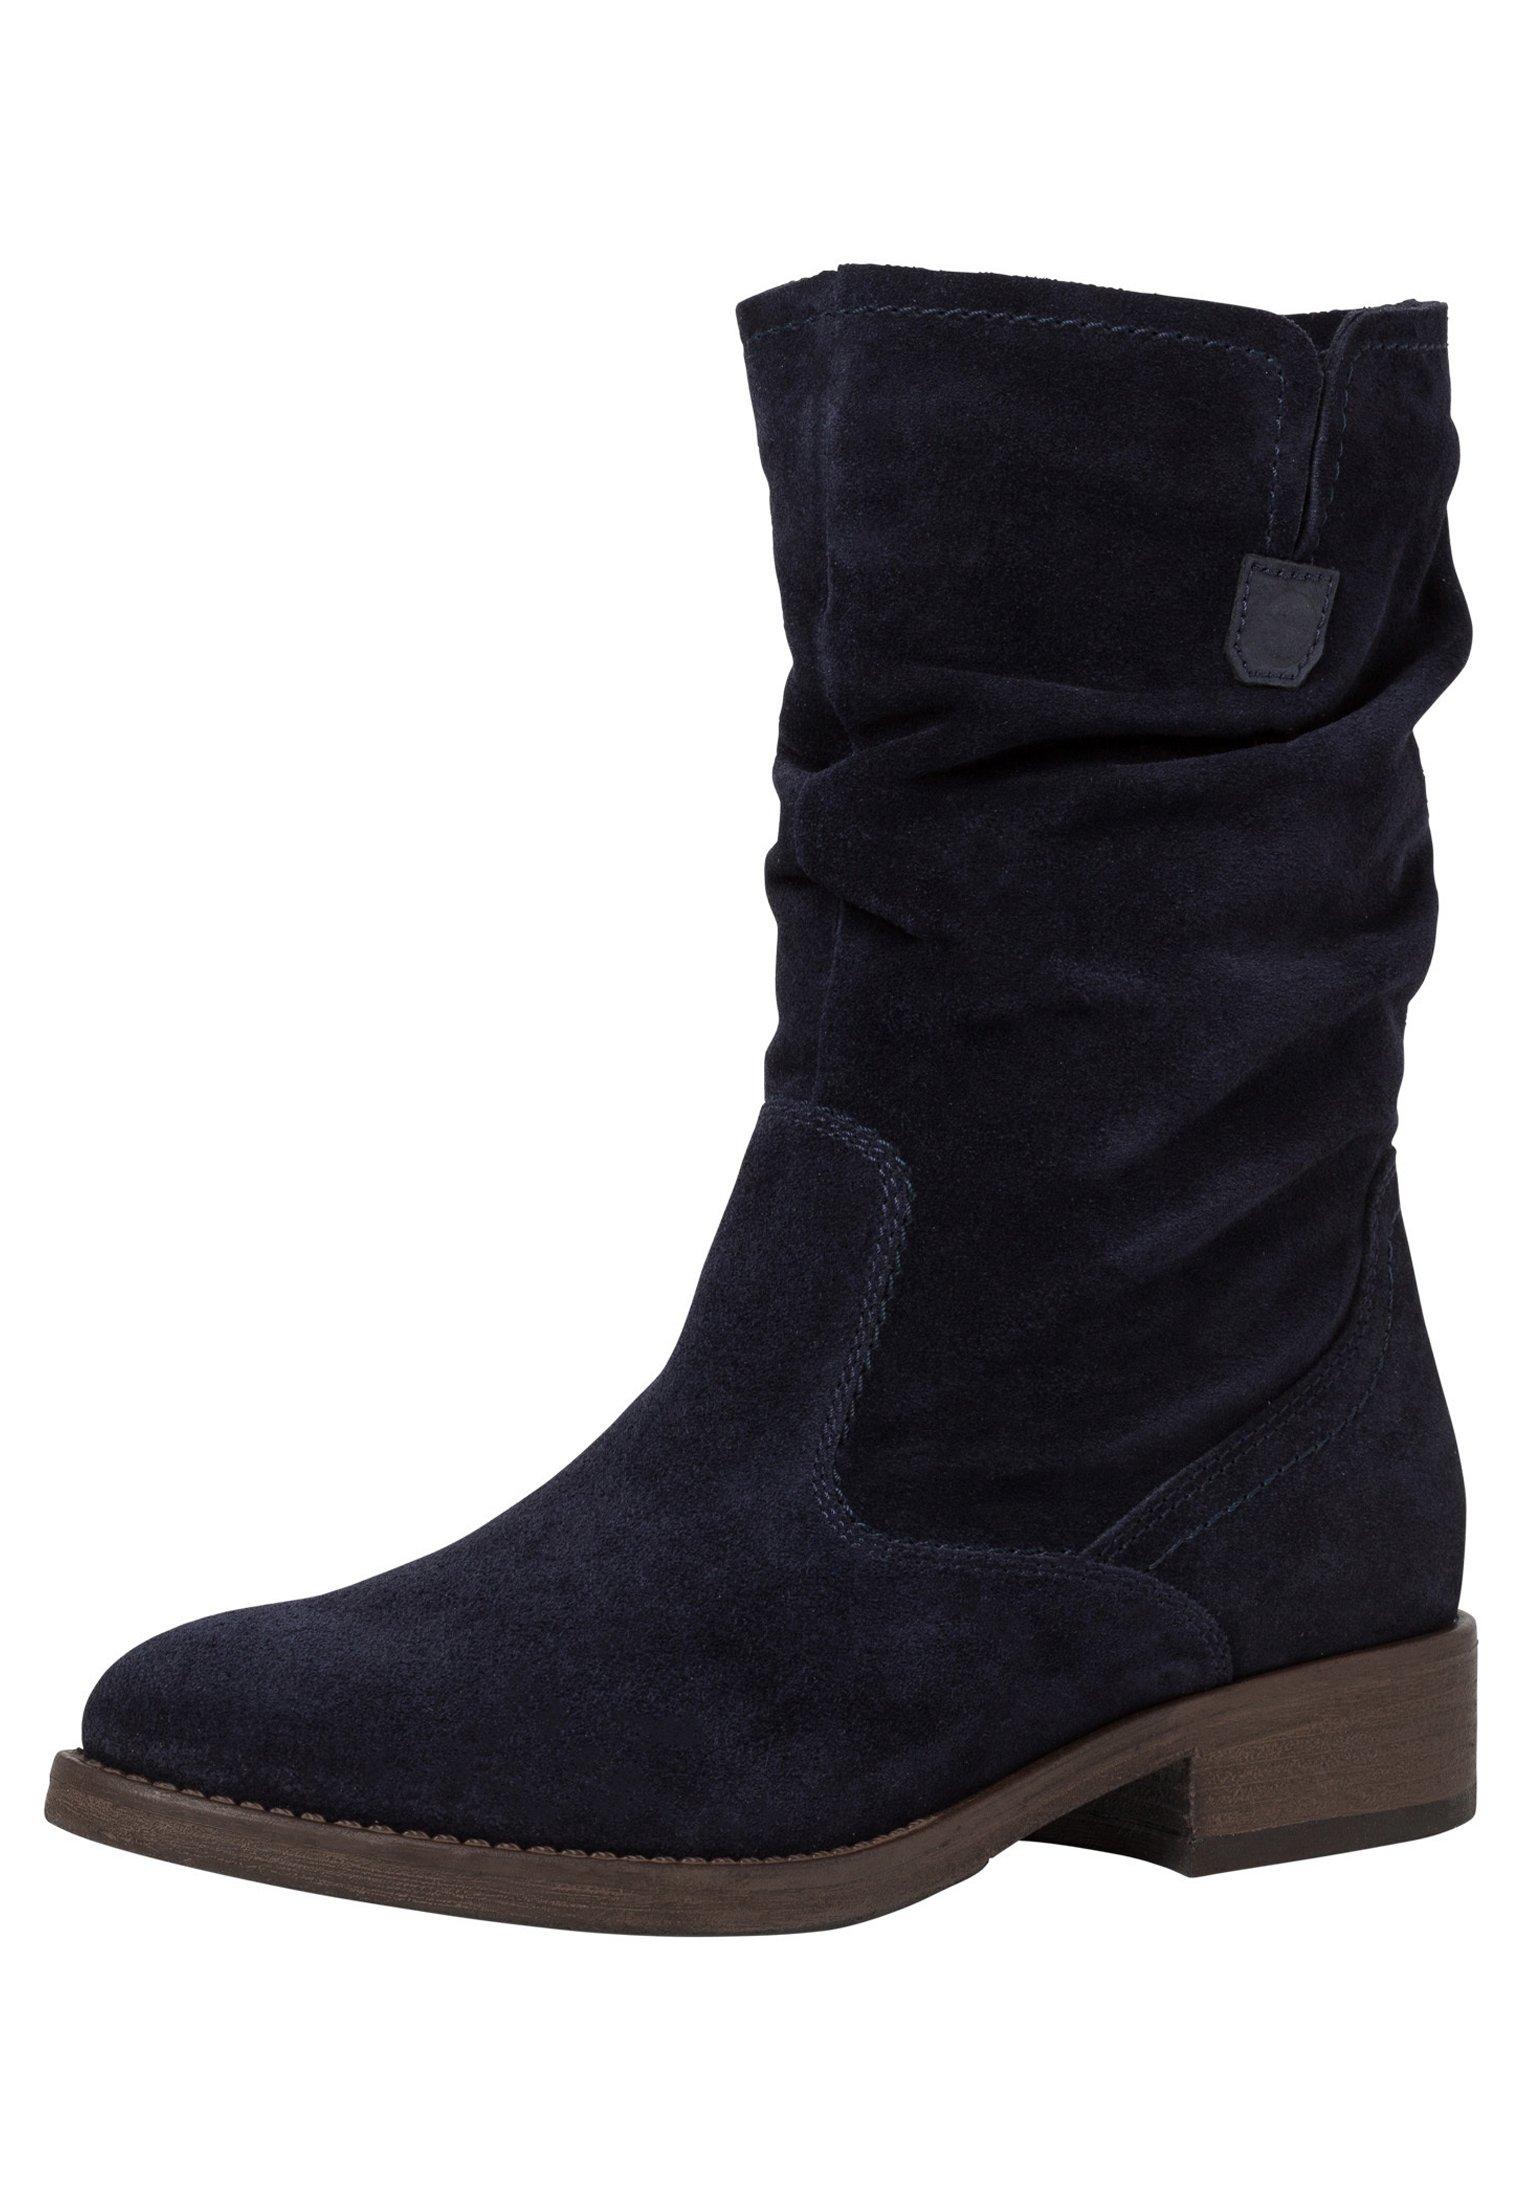 Tamaris BOOTS Stiefel navy/blau